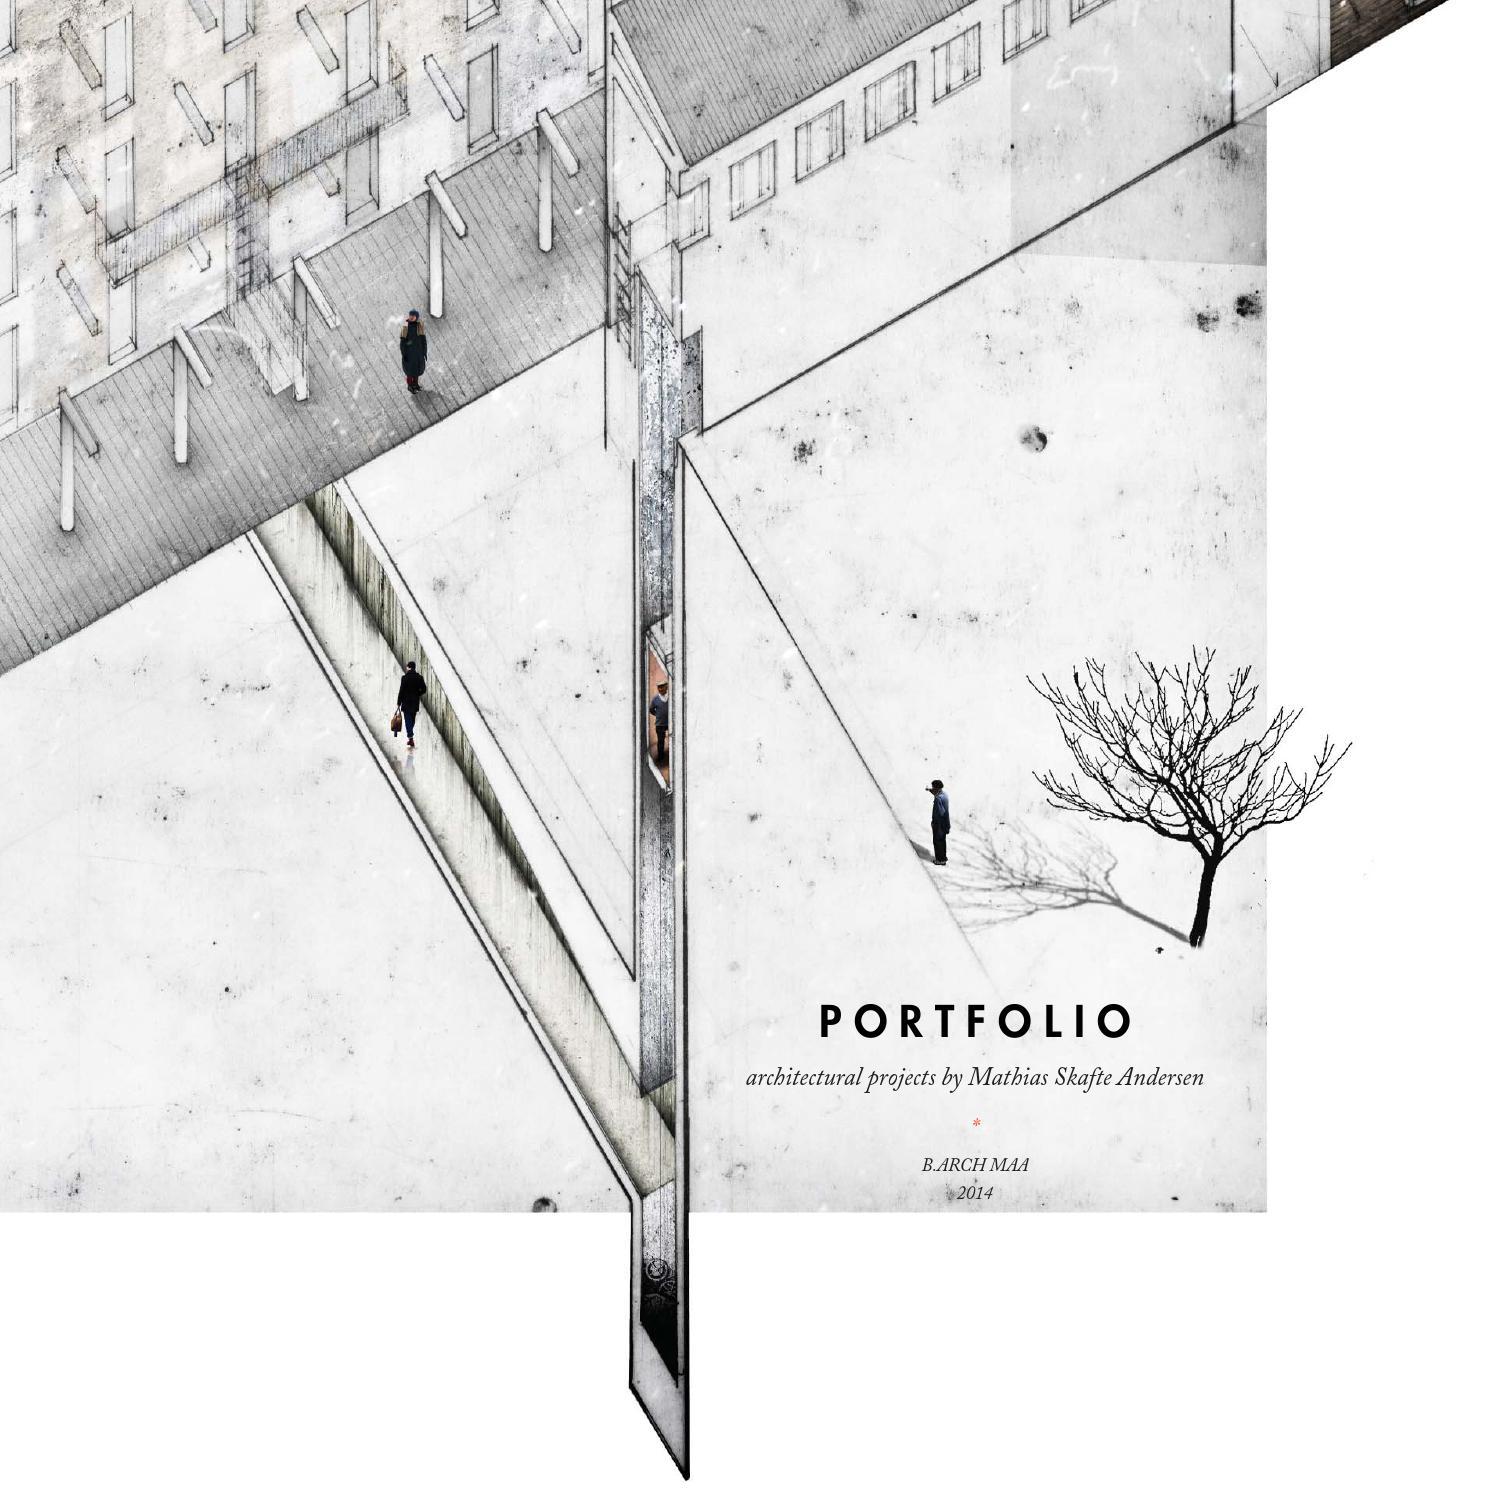 Architecture portfolio 2014 by mathias skafte andersen issuu for Interior design portfolio cover